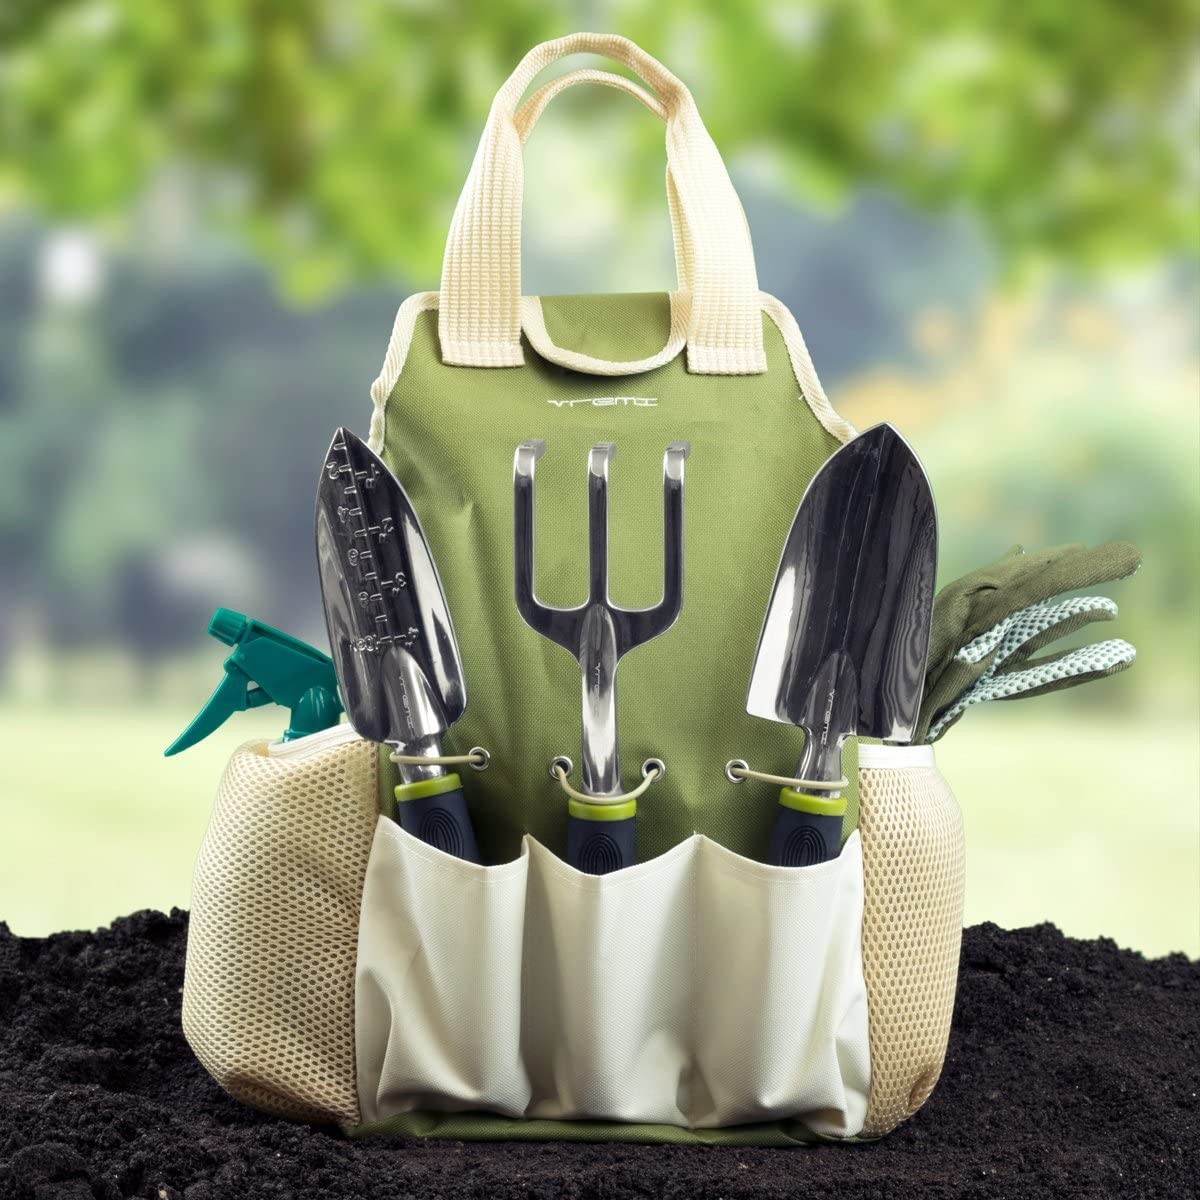 best hobbies for men - gardening kit bag tools